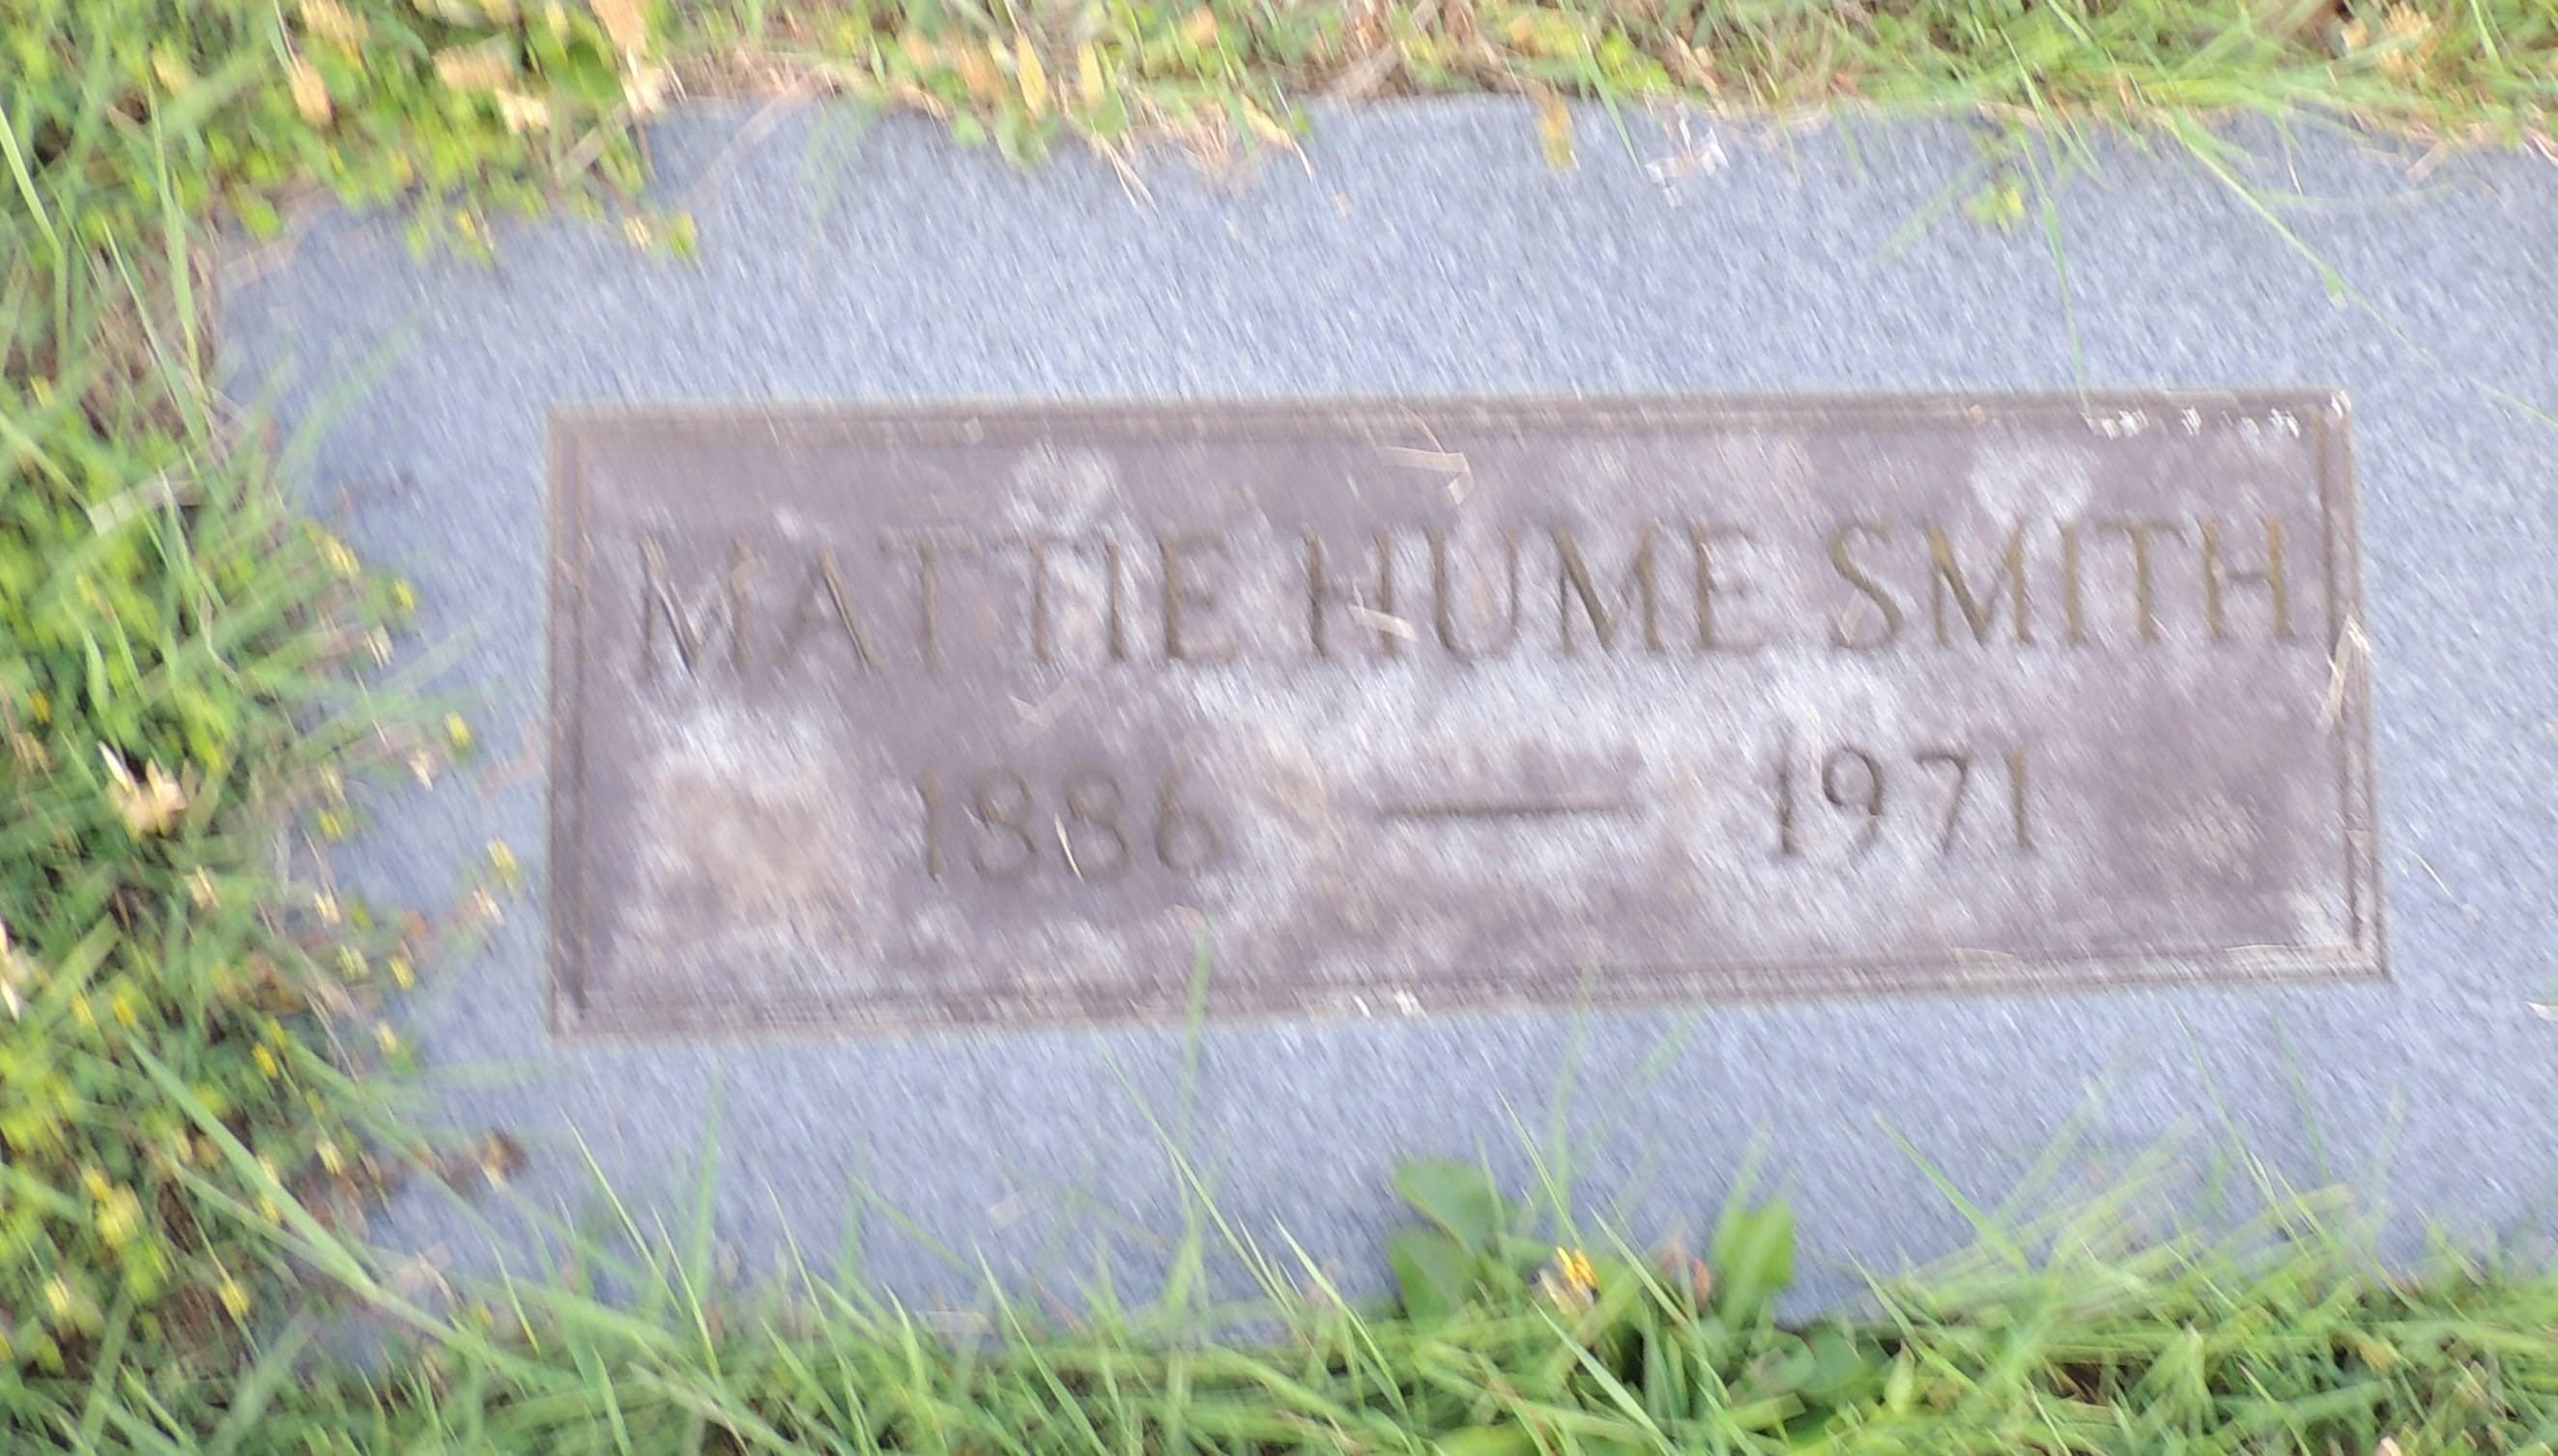 Mattie May Hume